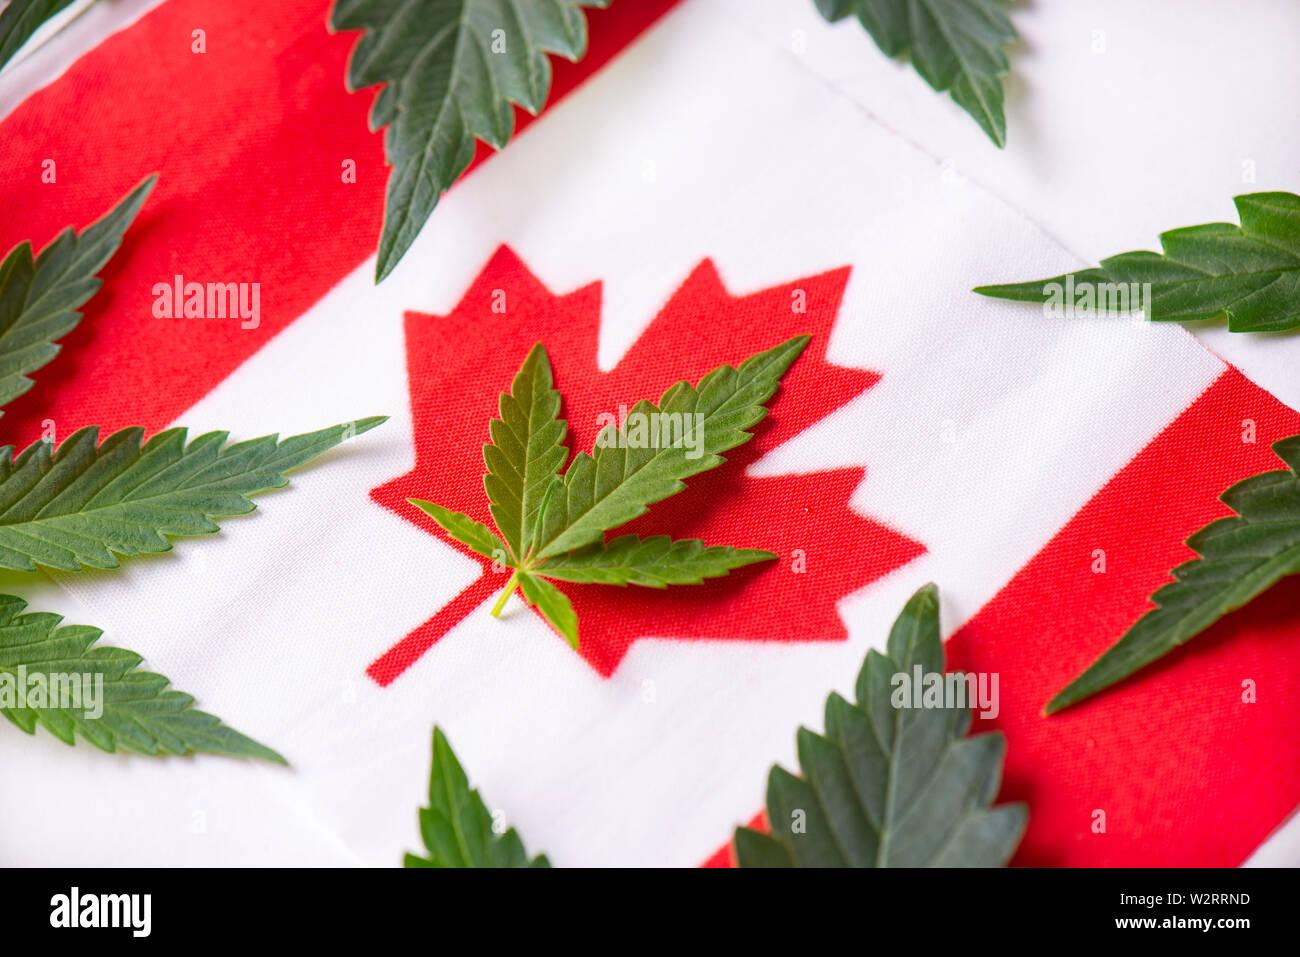 Canadian flag with cannabis leaf - canada marijuana concept background Stock Photo